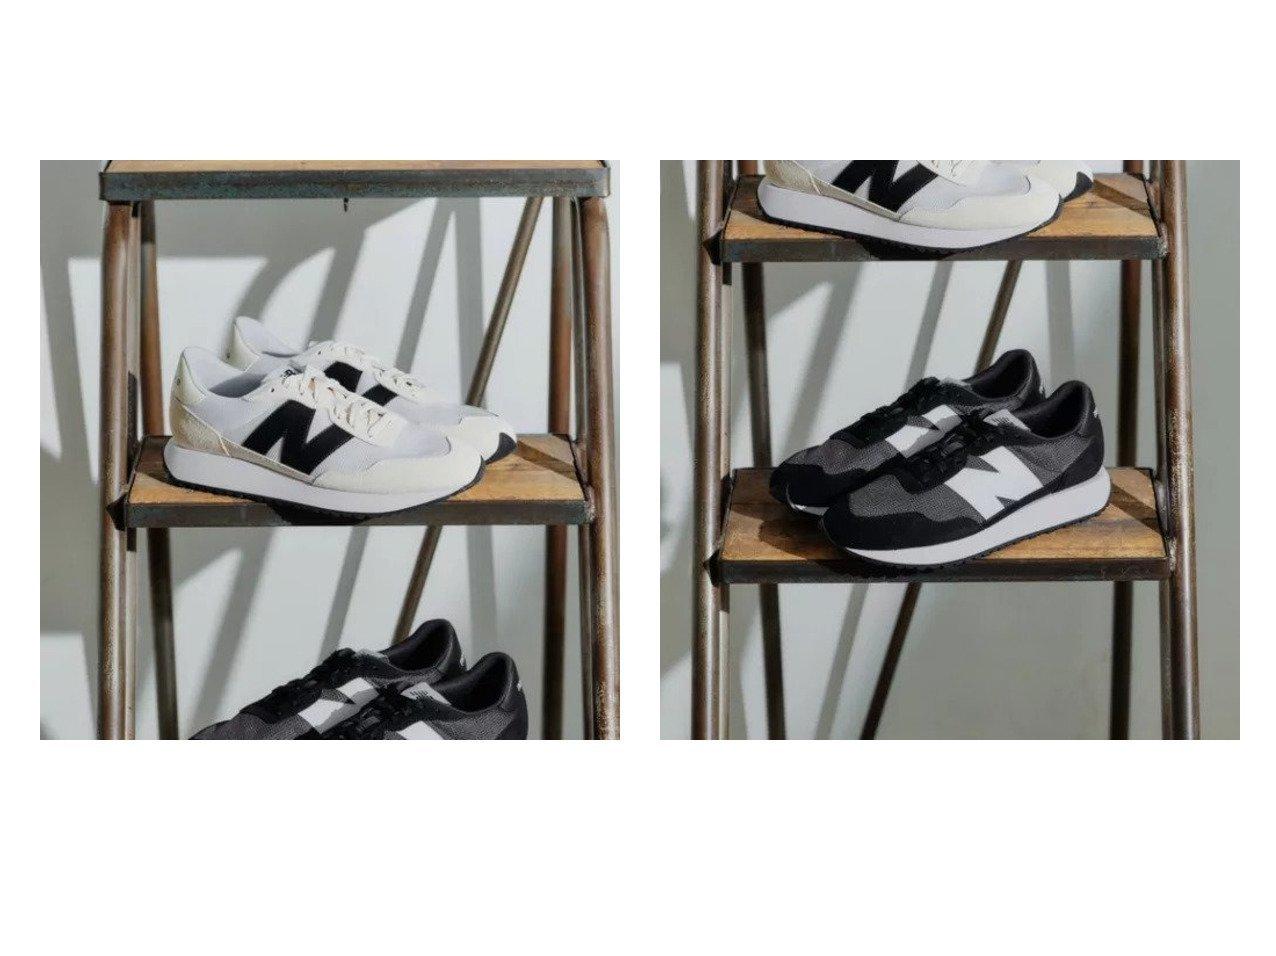 【green label relaxing / UNITED ARROWS/グリーンレーベル リラクシング / ユナイテッドアローズ】の[ ニューバランス ] New Balance SC MS237 スニーカー 【シューズ・靴】おすすめ!人気、トレンド・レディースファッションの通販   おすすめで人気の流行・トレンド、ファッションの通販商品 インテリア・家具・メンズファッション・キッズファッション・レディースファッション・服の通販 founy(ファニー) https://founy.com/ ファッション Fashion レディースファッション WOMEN コンビ シューズ スタイリッシュ スニーカー スリム 定番 Standard バランス ビッグ フィット ランニング |ID:crp329100000050464